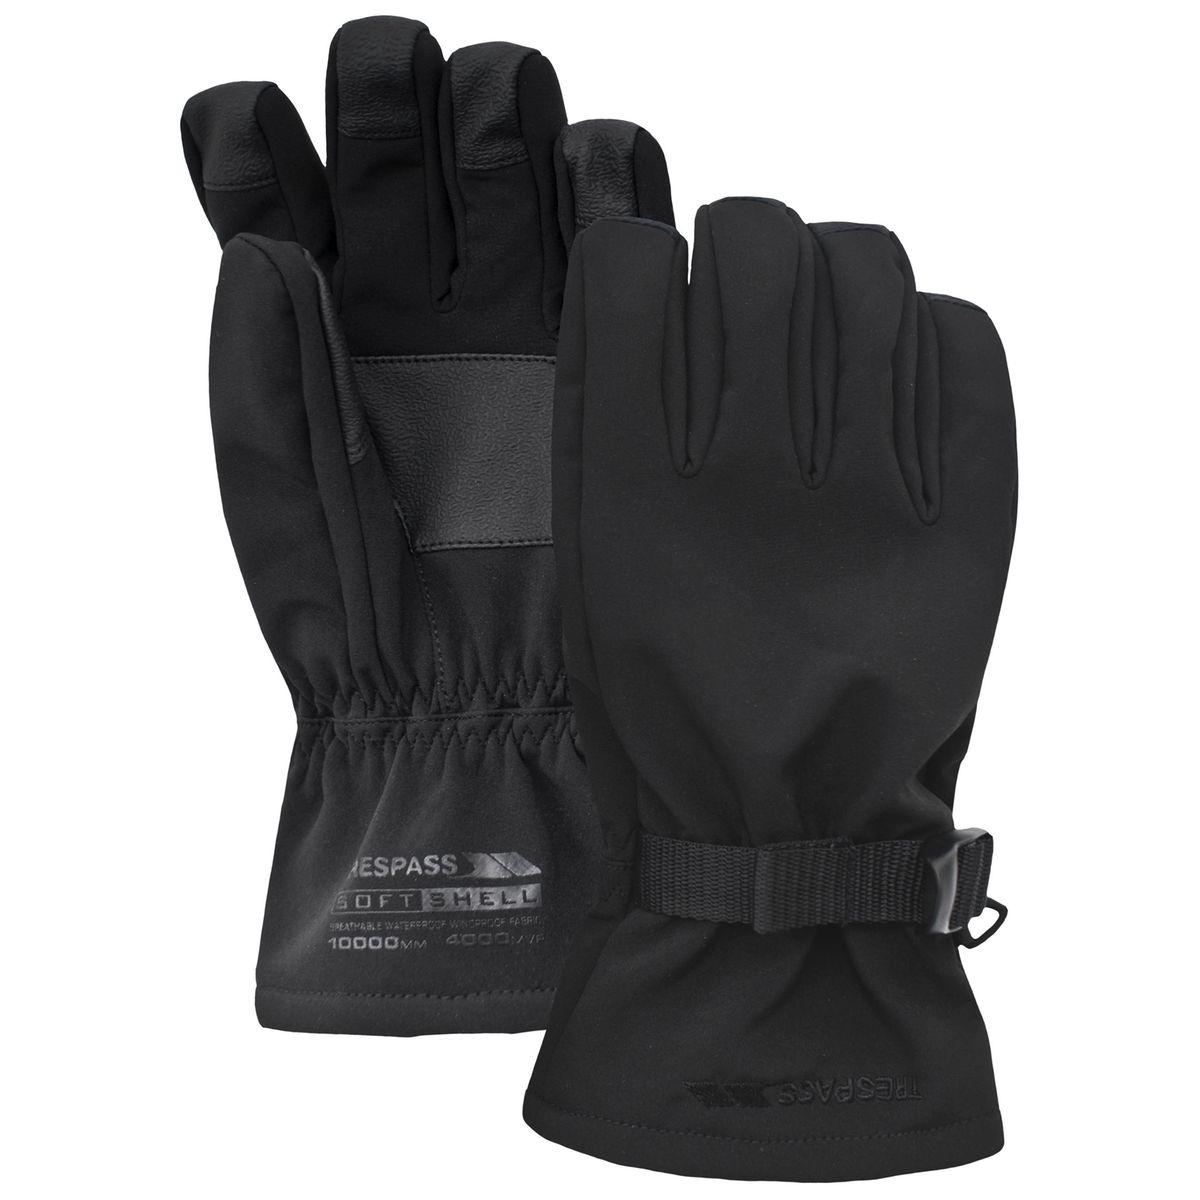 Goten gants en softshell adultes